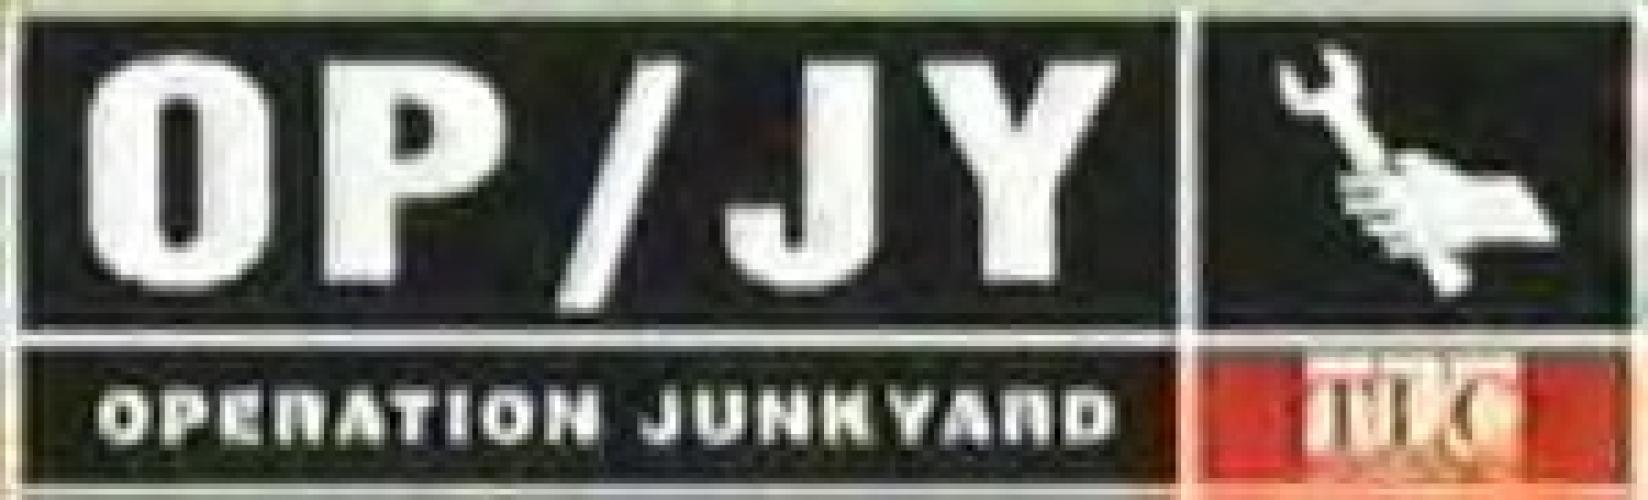 Operation Junkyard next episode air date poster